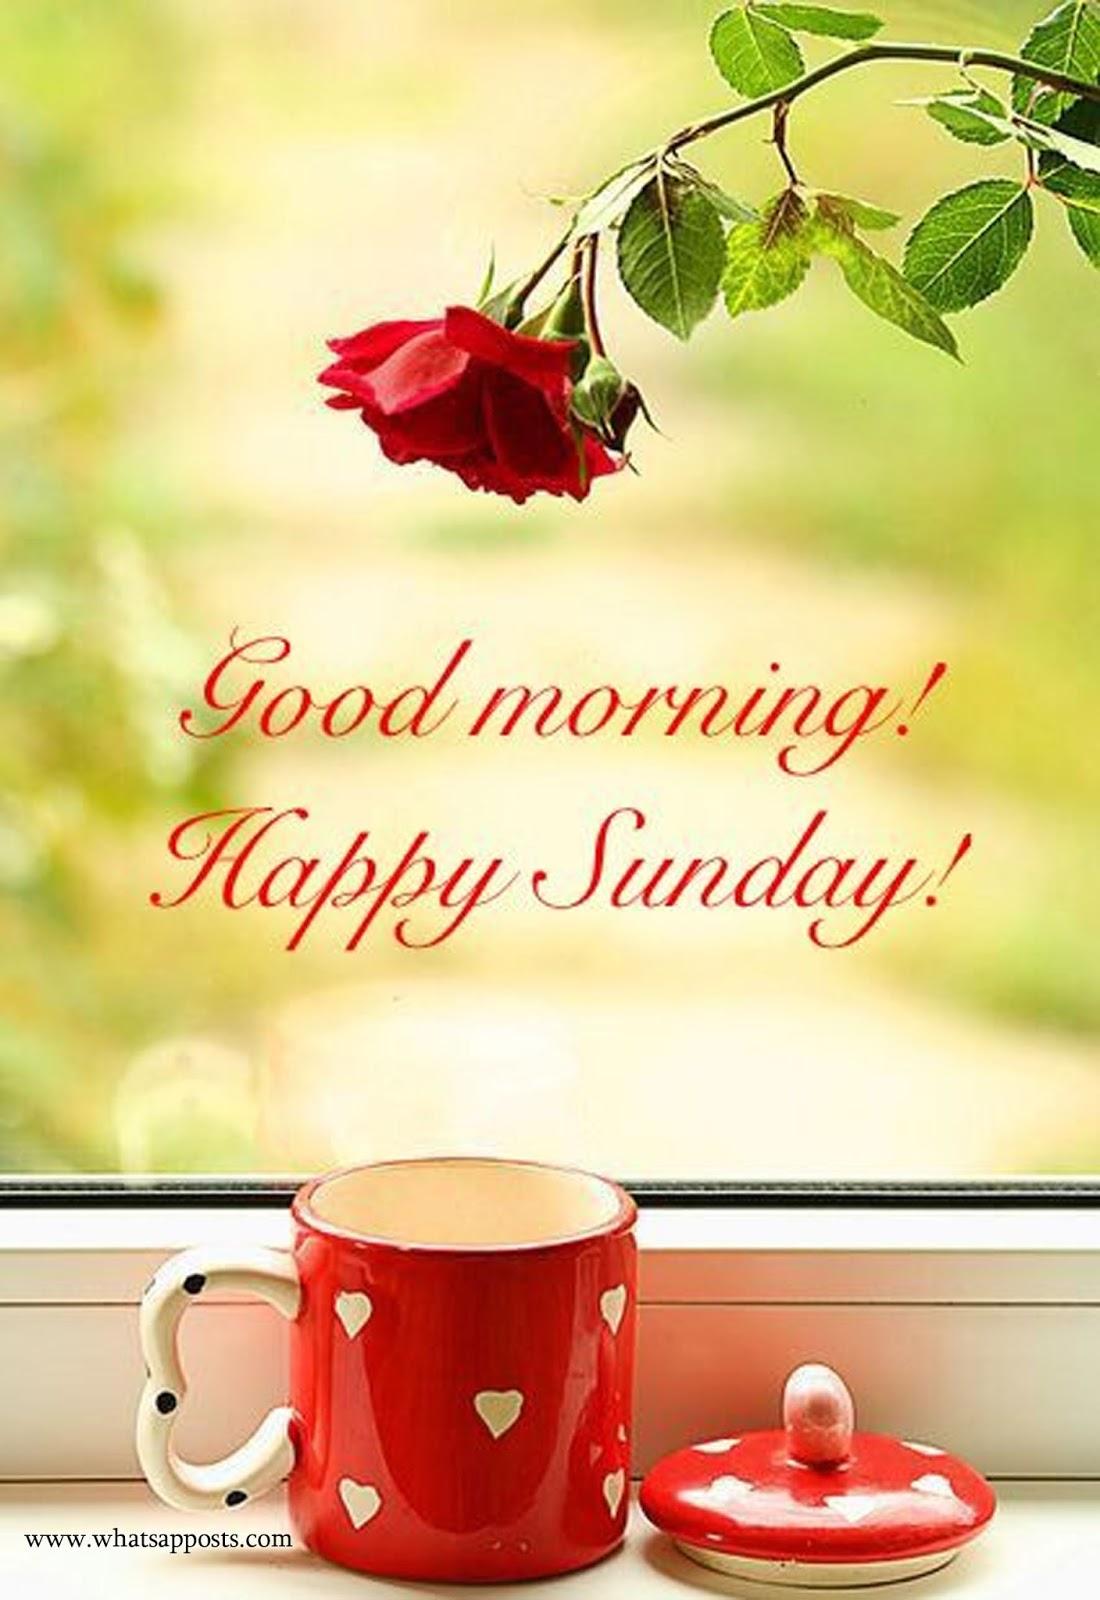 happy sunday wishes whatsapposts